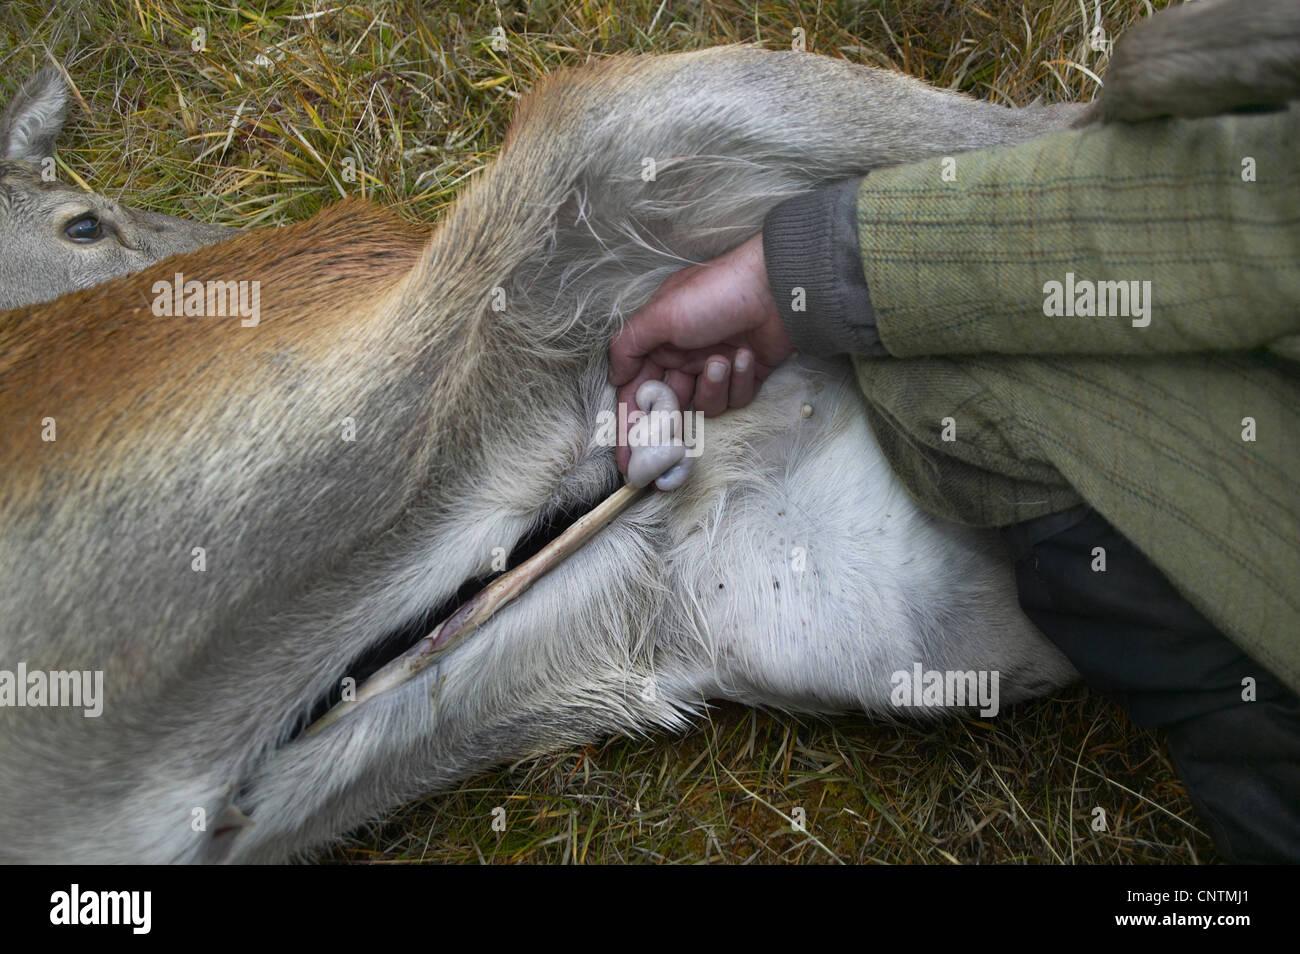 red deer (Cervus elaphus), stalker holding bowels between his hingers of a shot and opened animal, United Kingdom, - Stock Image